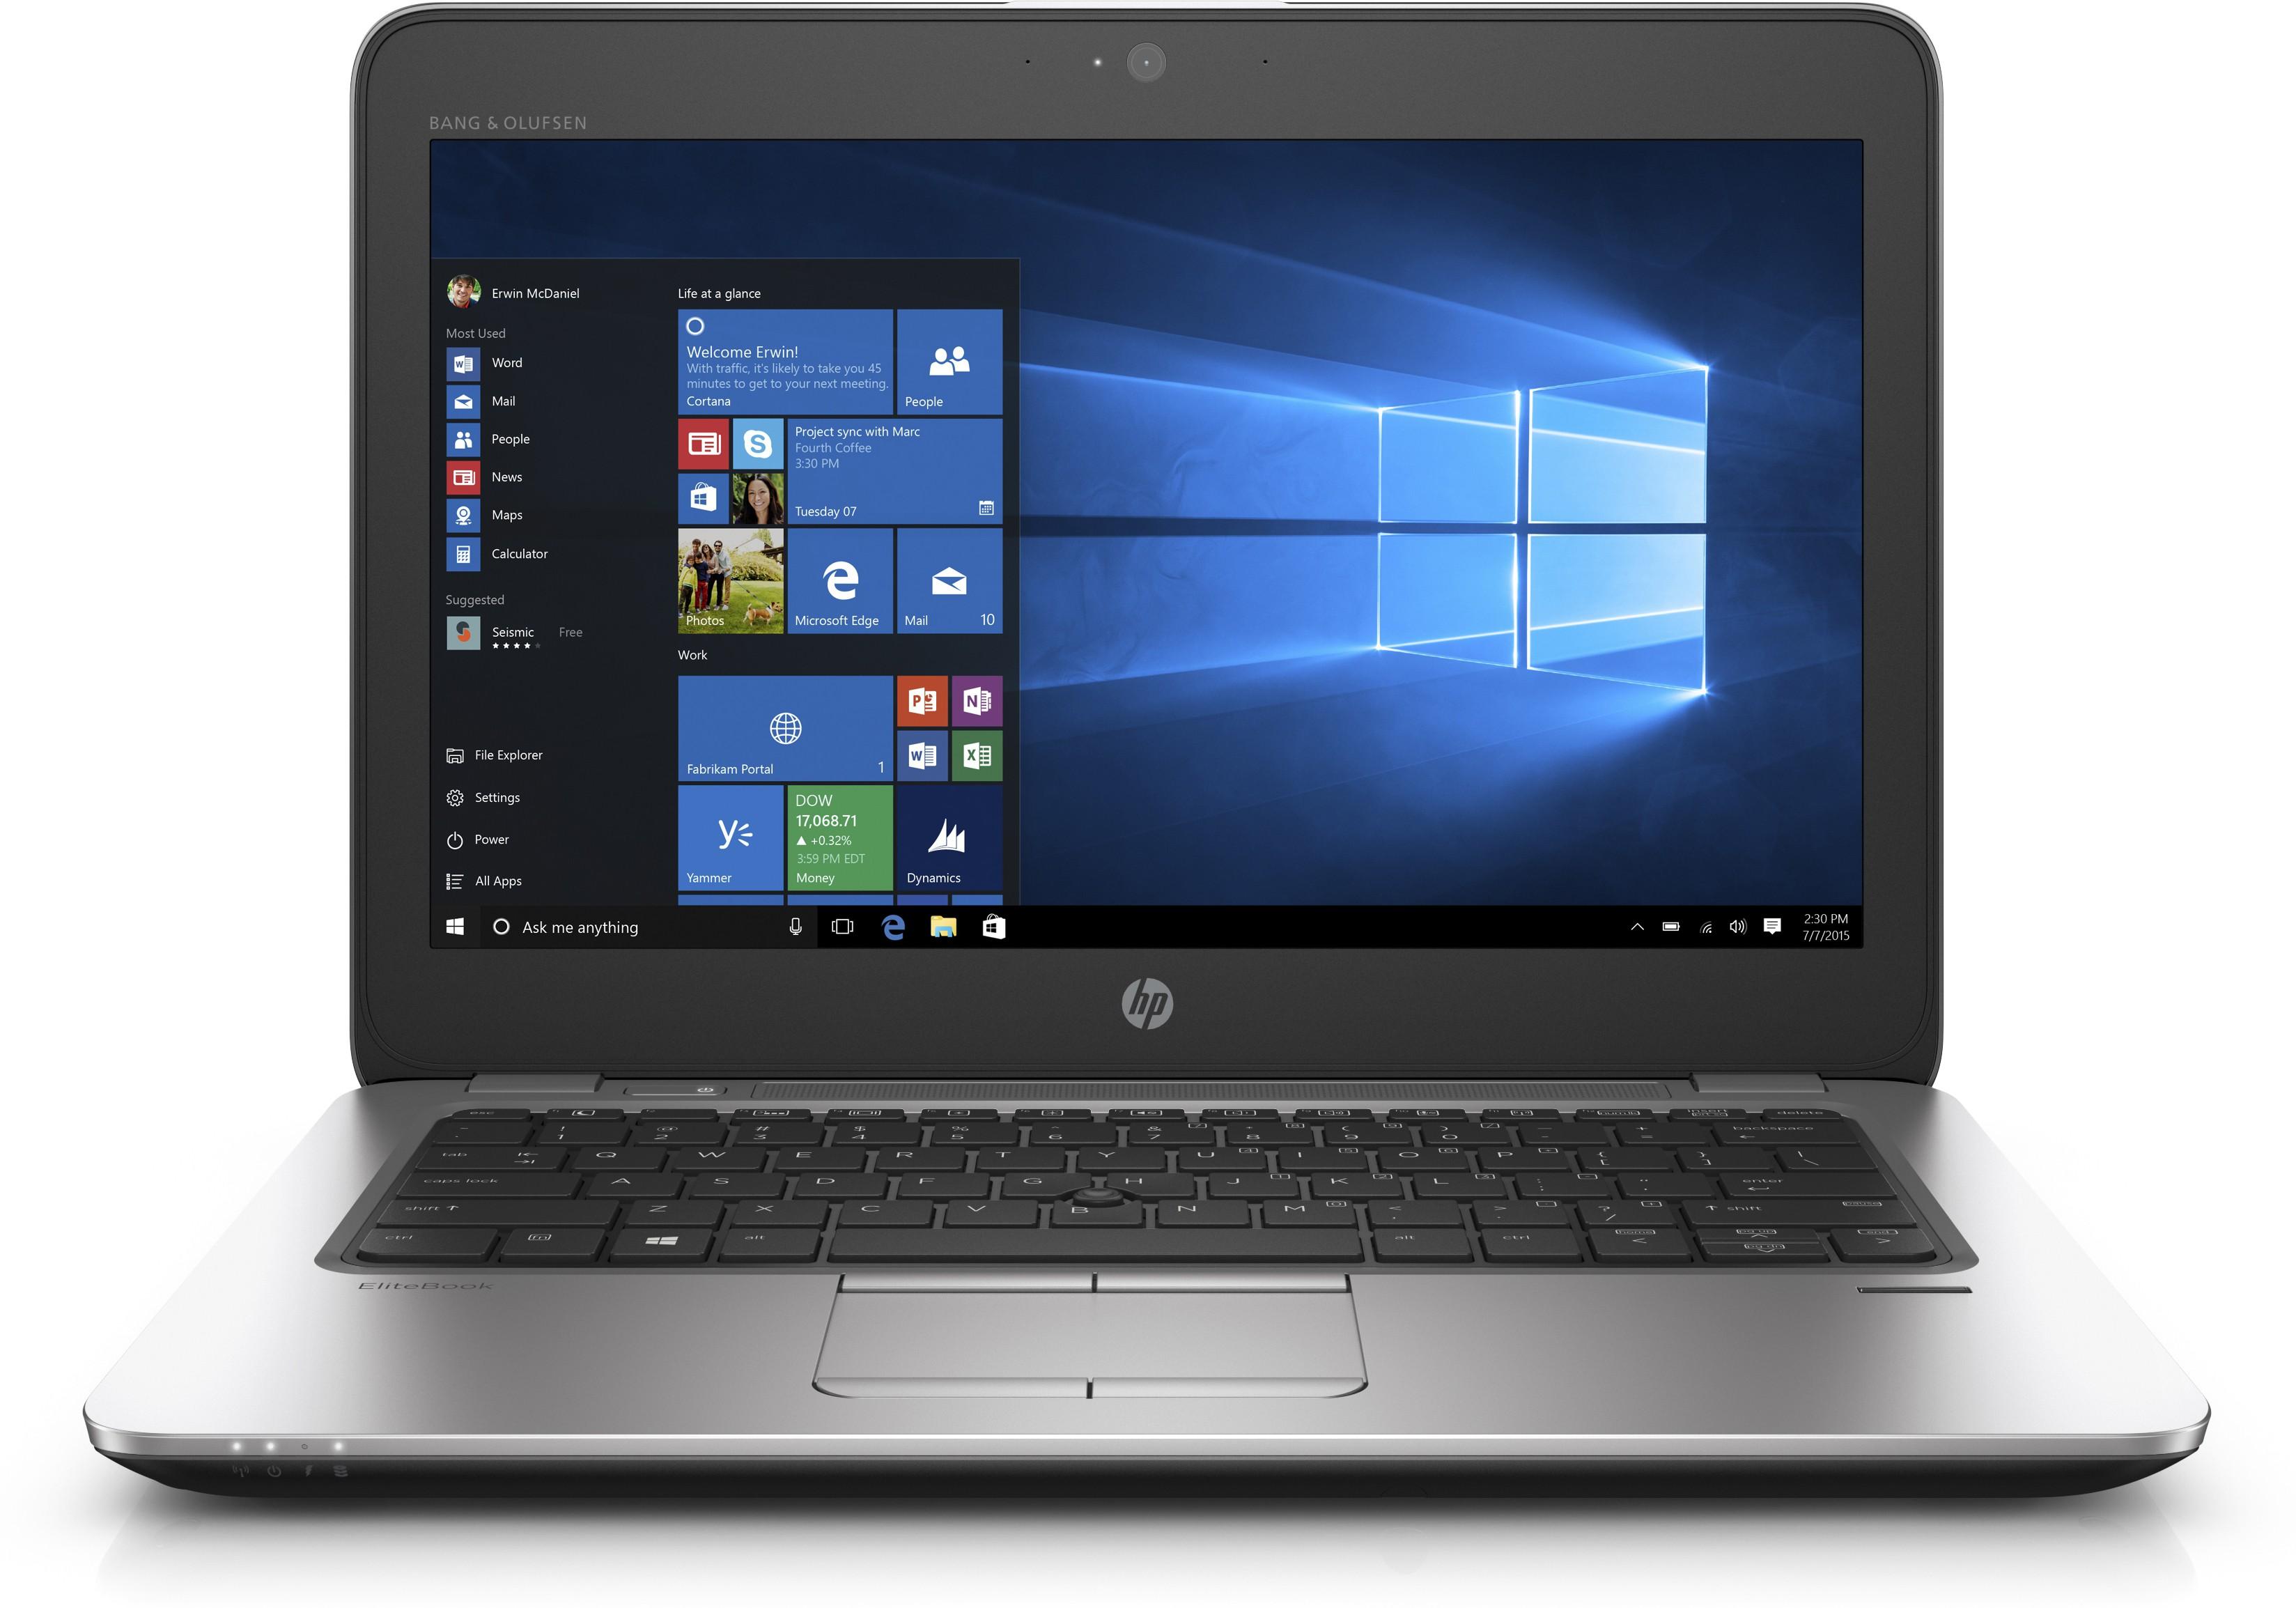 Deals - Behror - HP Spectre <br> Flat ₹10k off on Exchange<br> Category - computers<br> Business - Flipkart.com